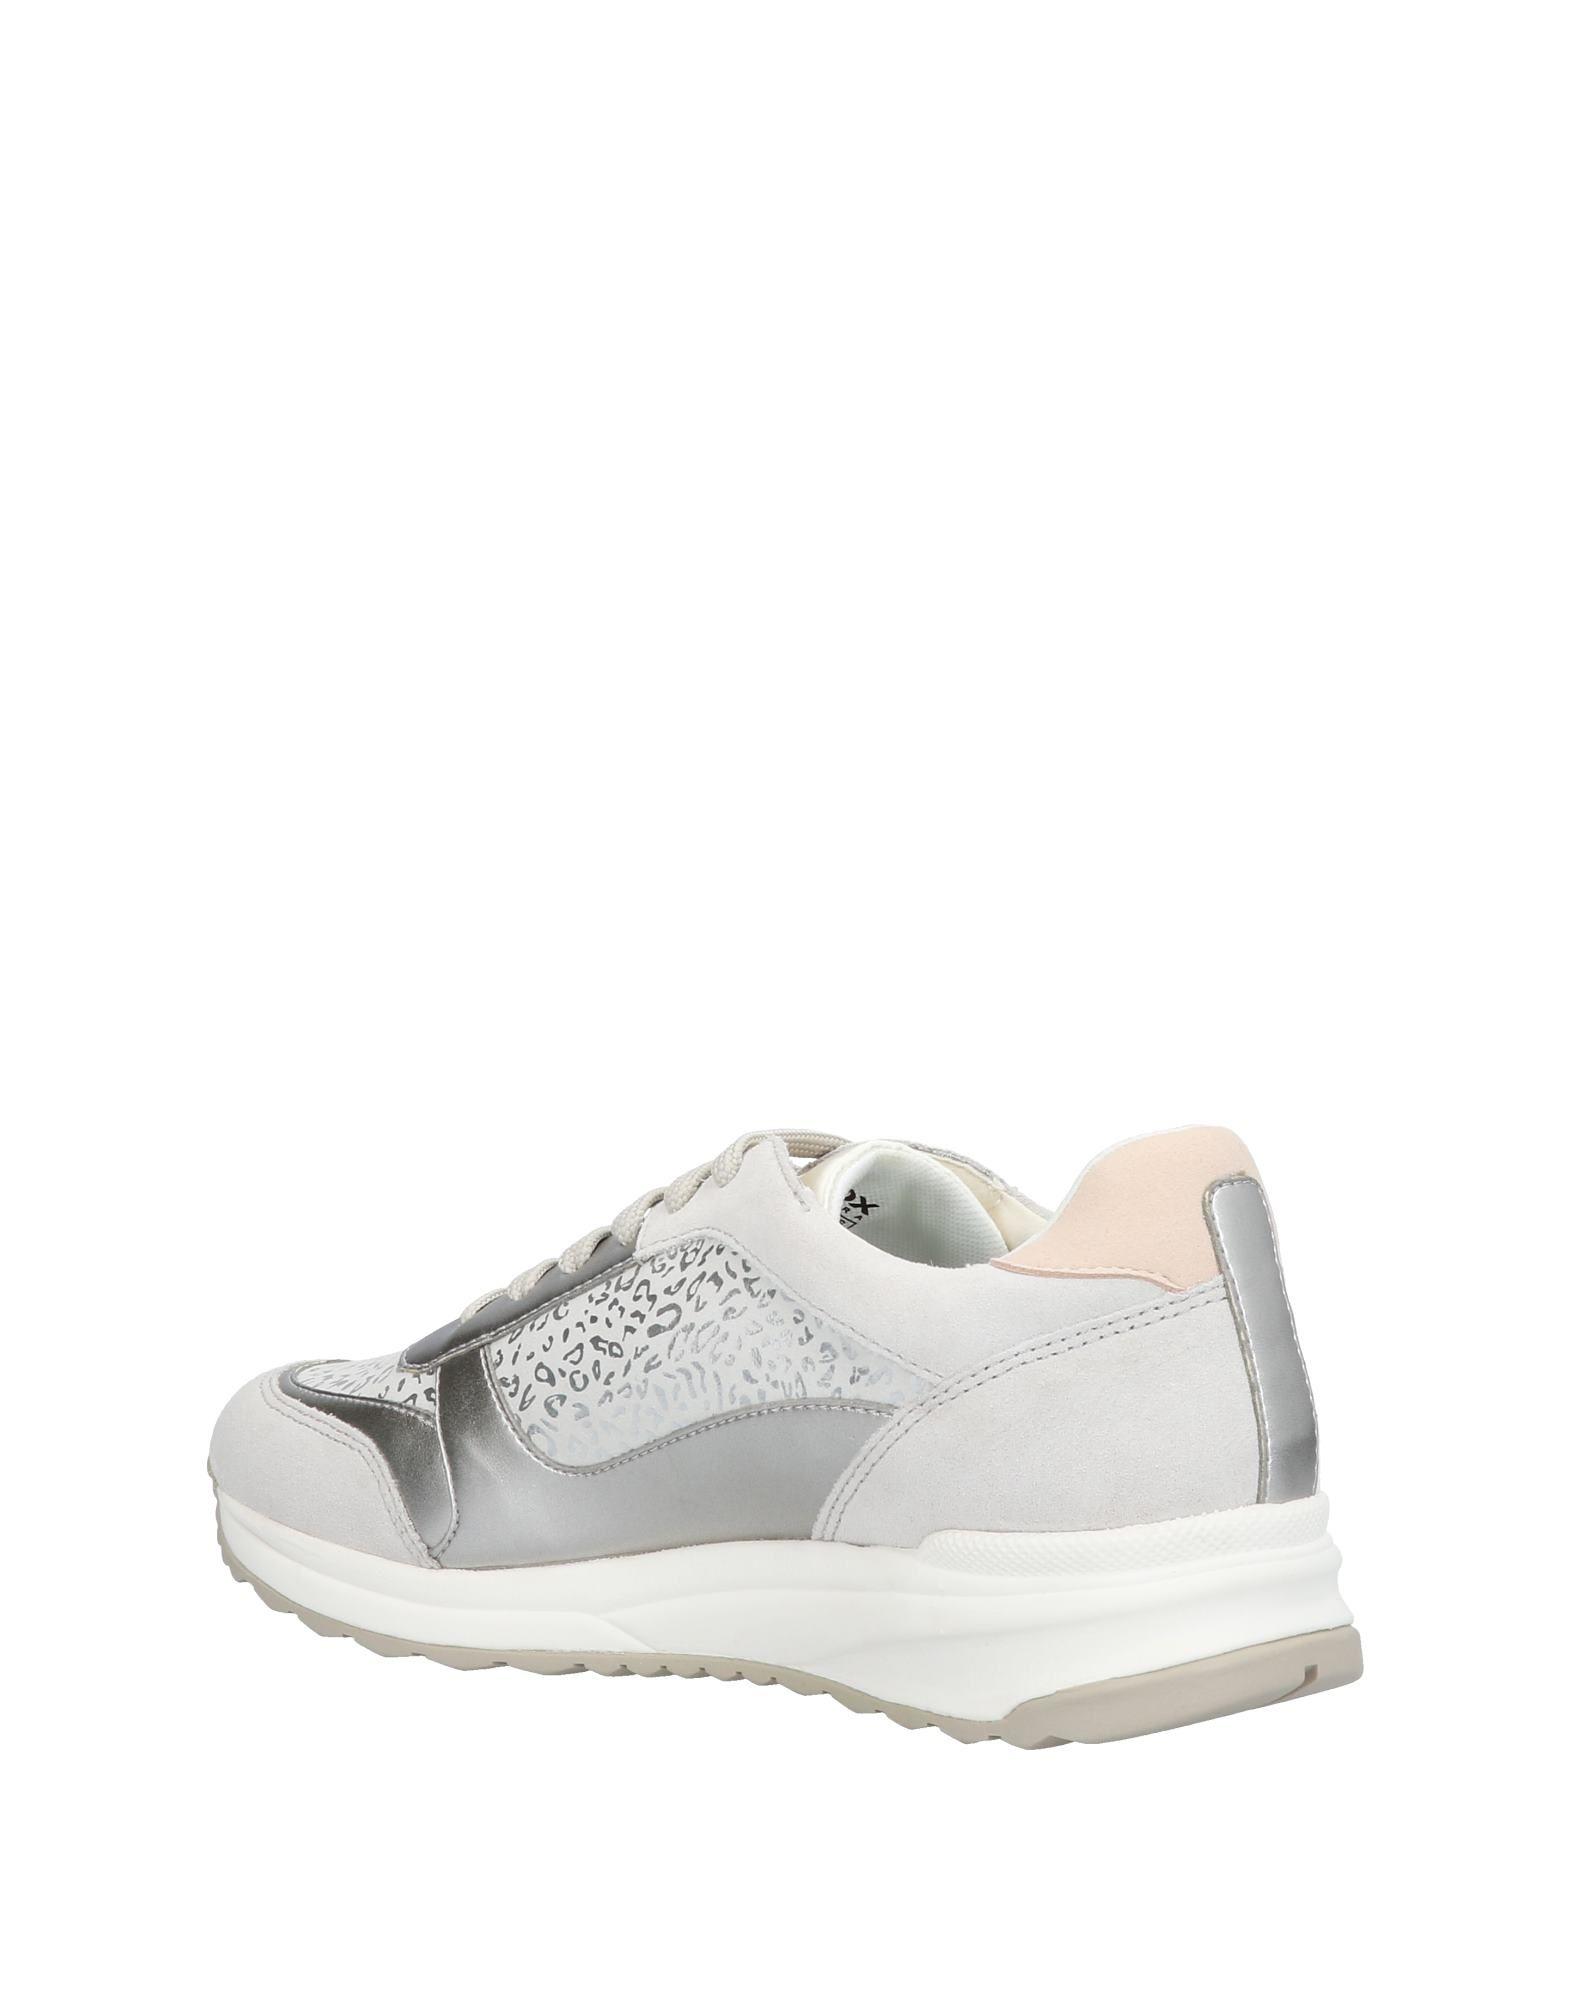 Geox Sneakers Damen   Damen 11427357SR  8ec4fa